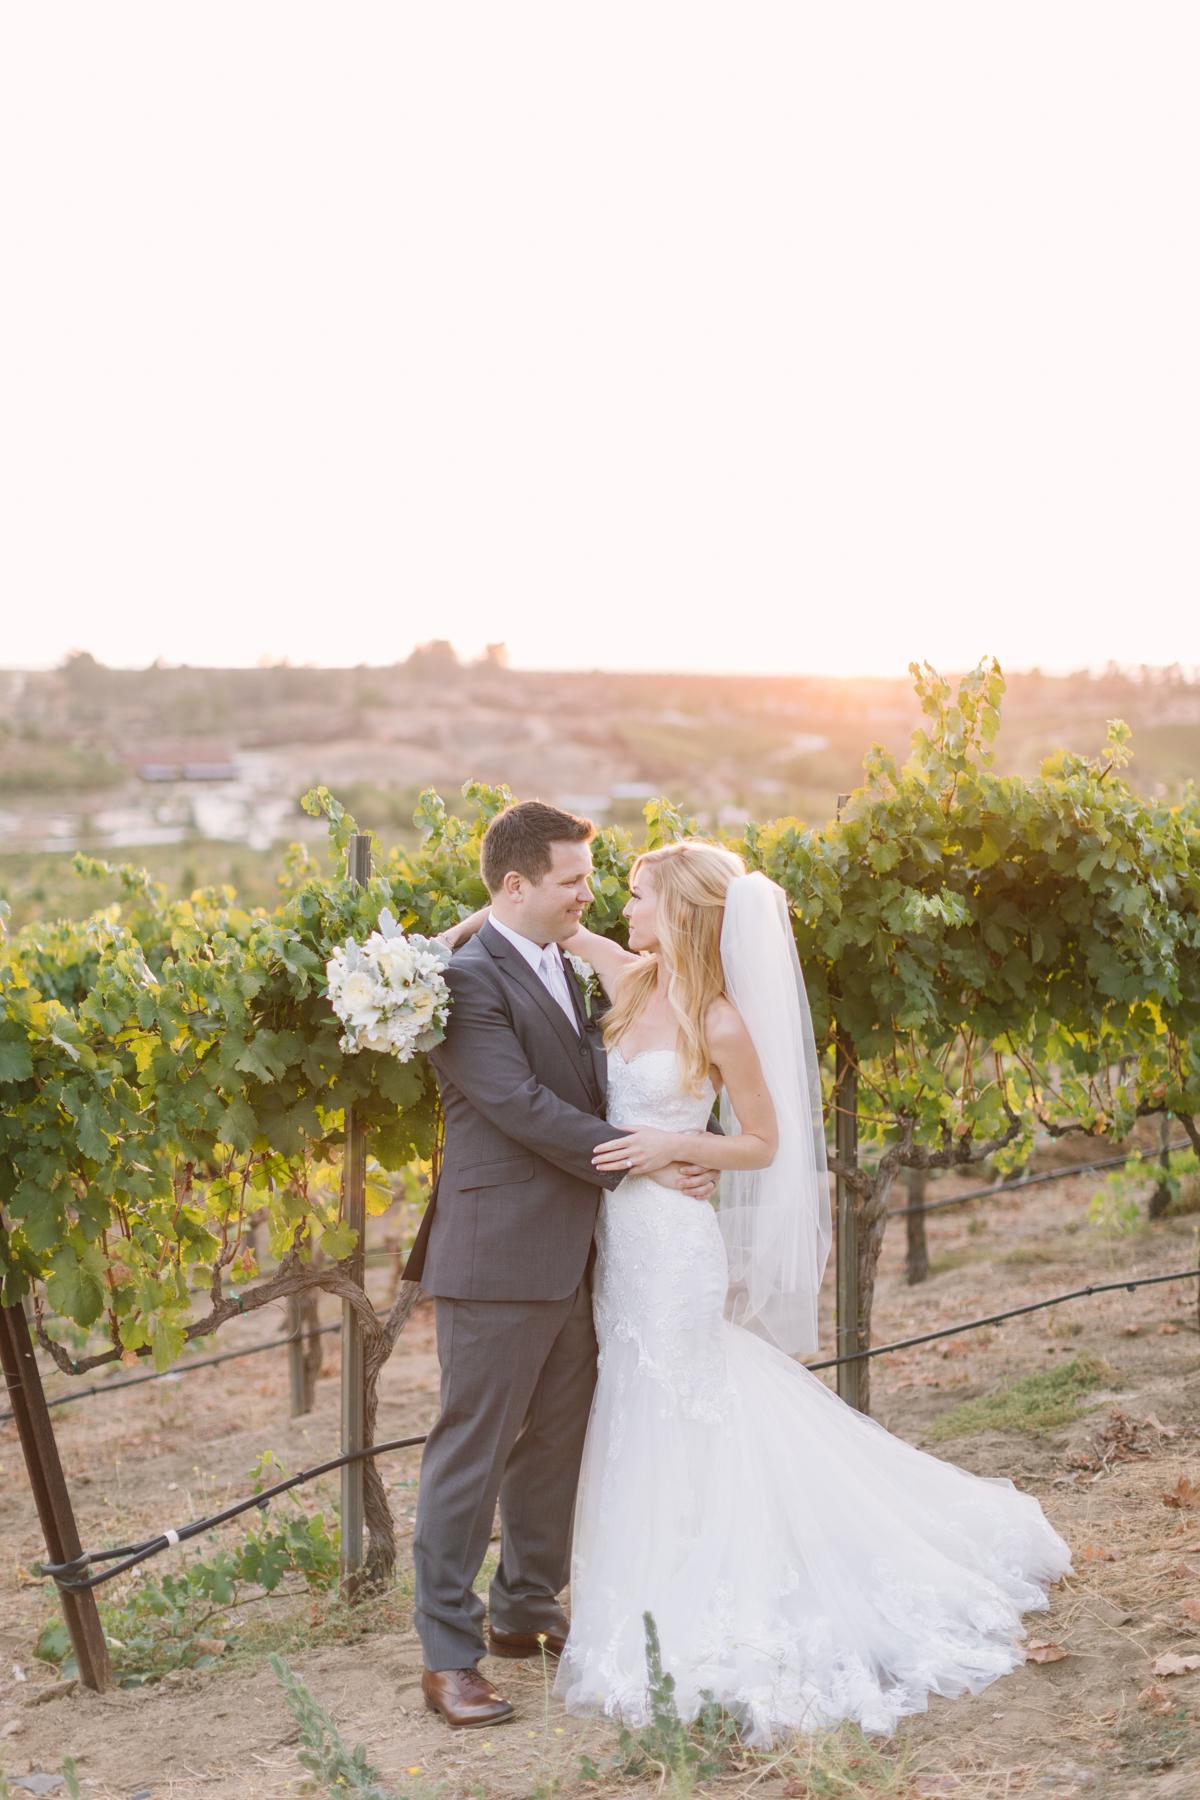 Orange-County-Wedding-Photography-Brianna-Caster-and-Co-Photographers-Falkner-Winery-Wedding-2